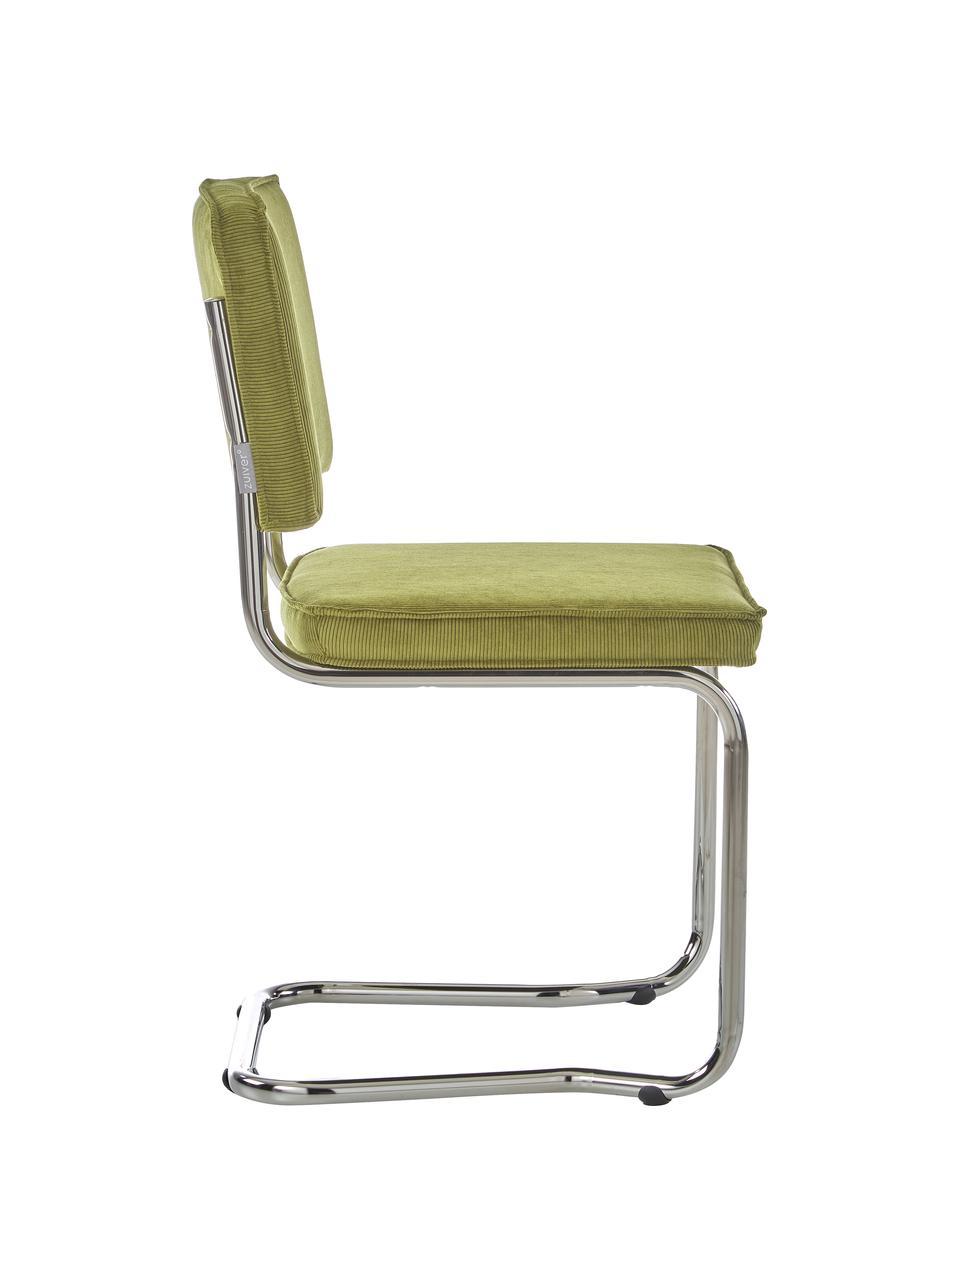 Chaise cantilever velours côtelé vert olive Kink, Vert